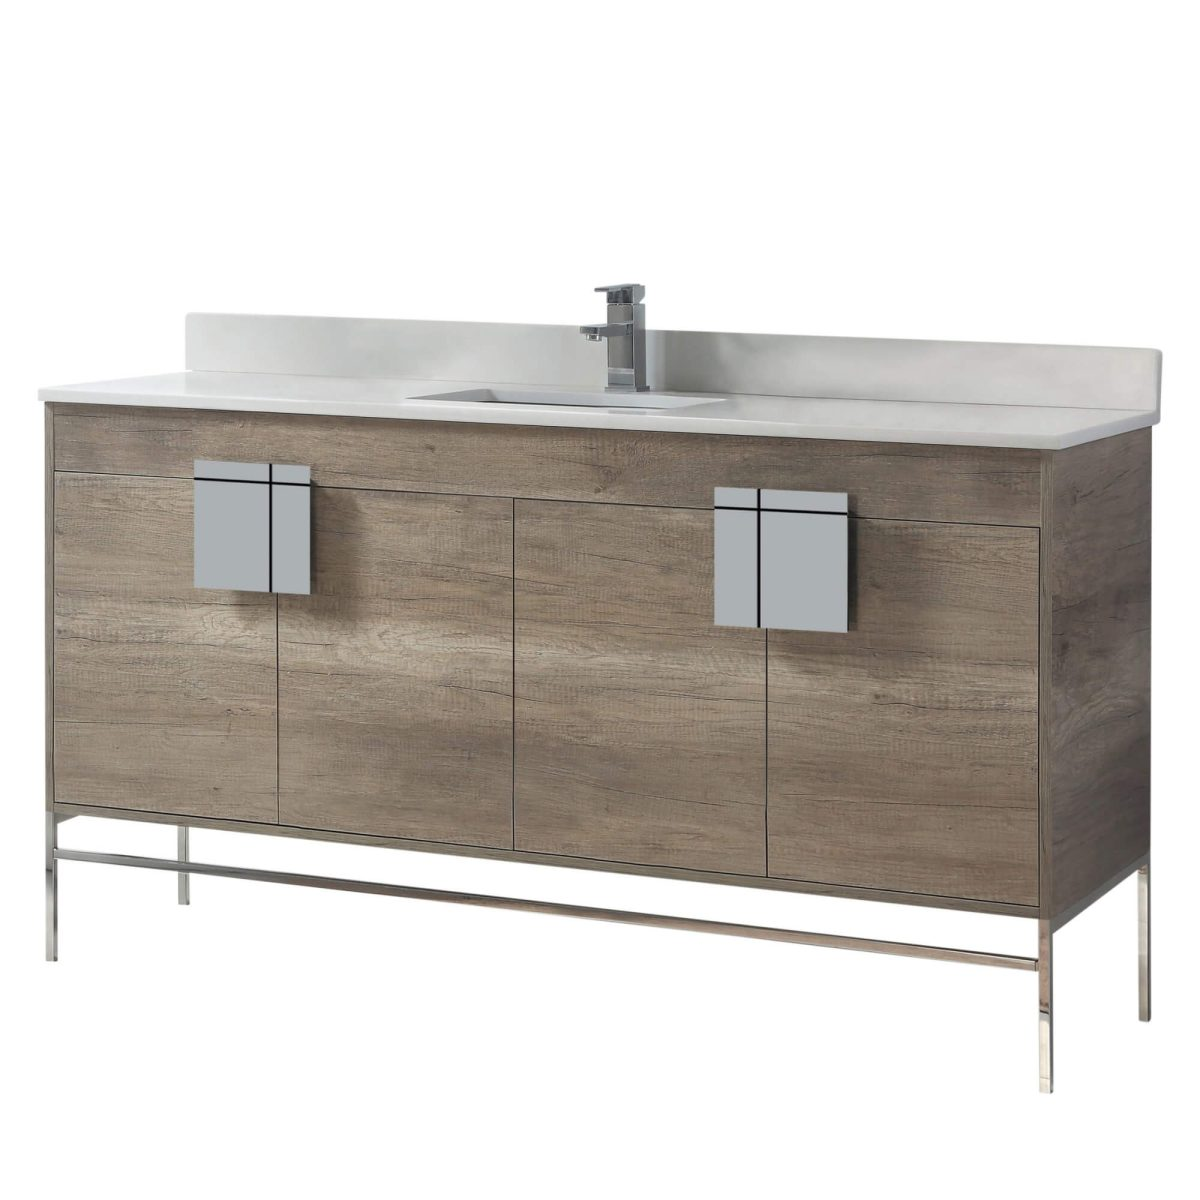 "Shawbridge 60"" Modern Single Bathroom Vanity  Shadow Gray with Polished Chrome Hardware"